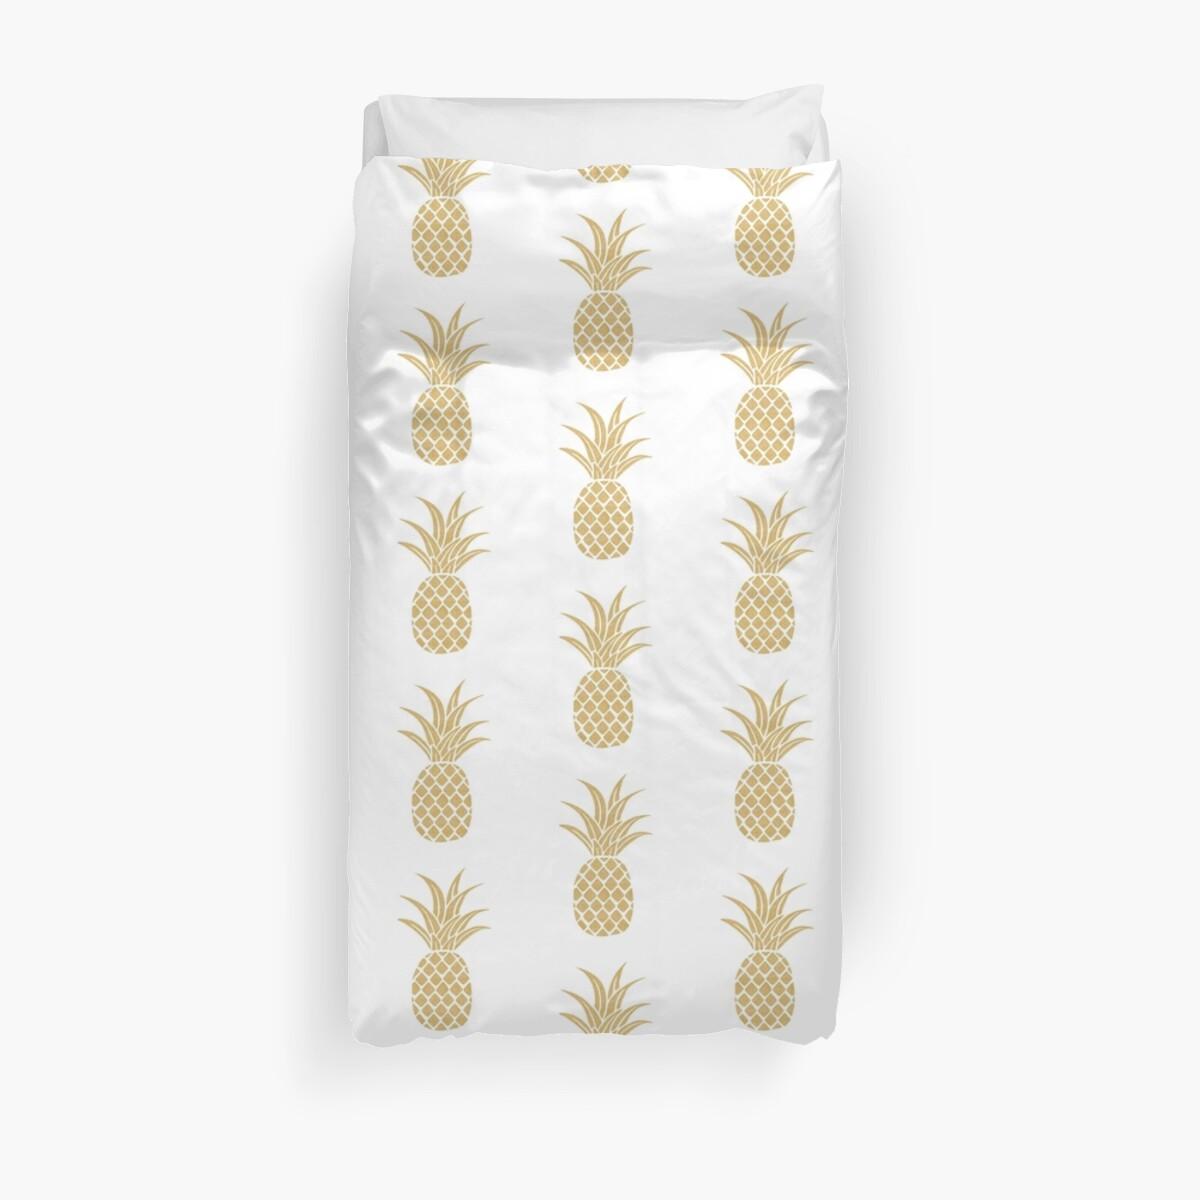 Gold Ananas von bombinodesigns